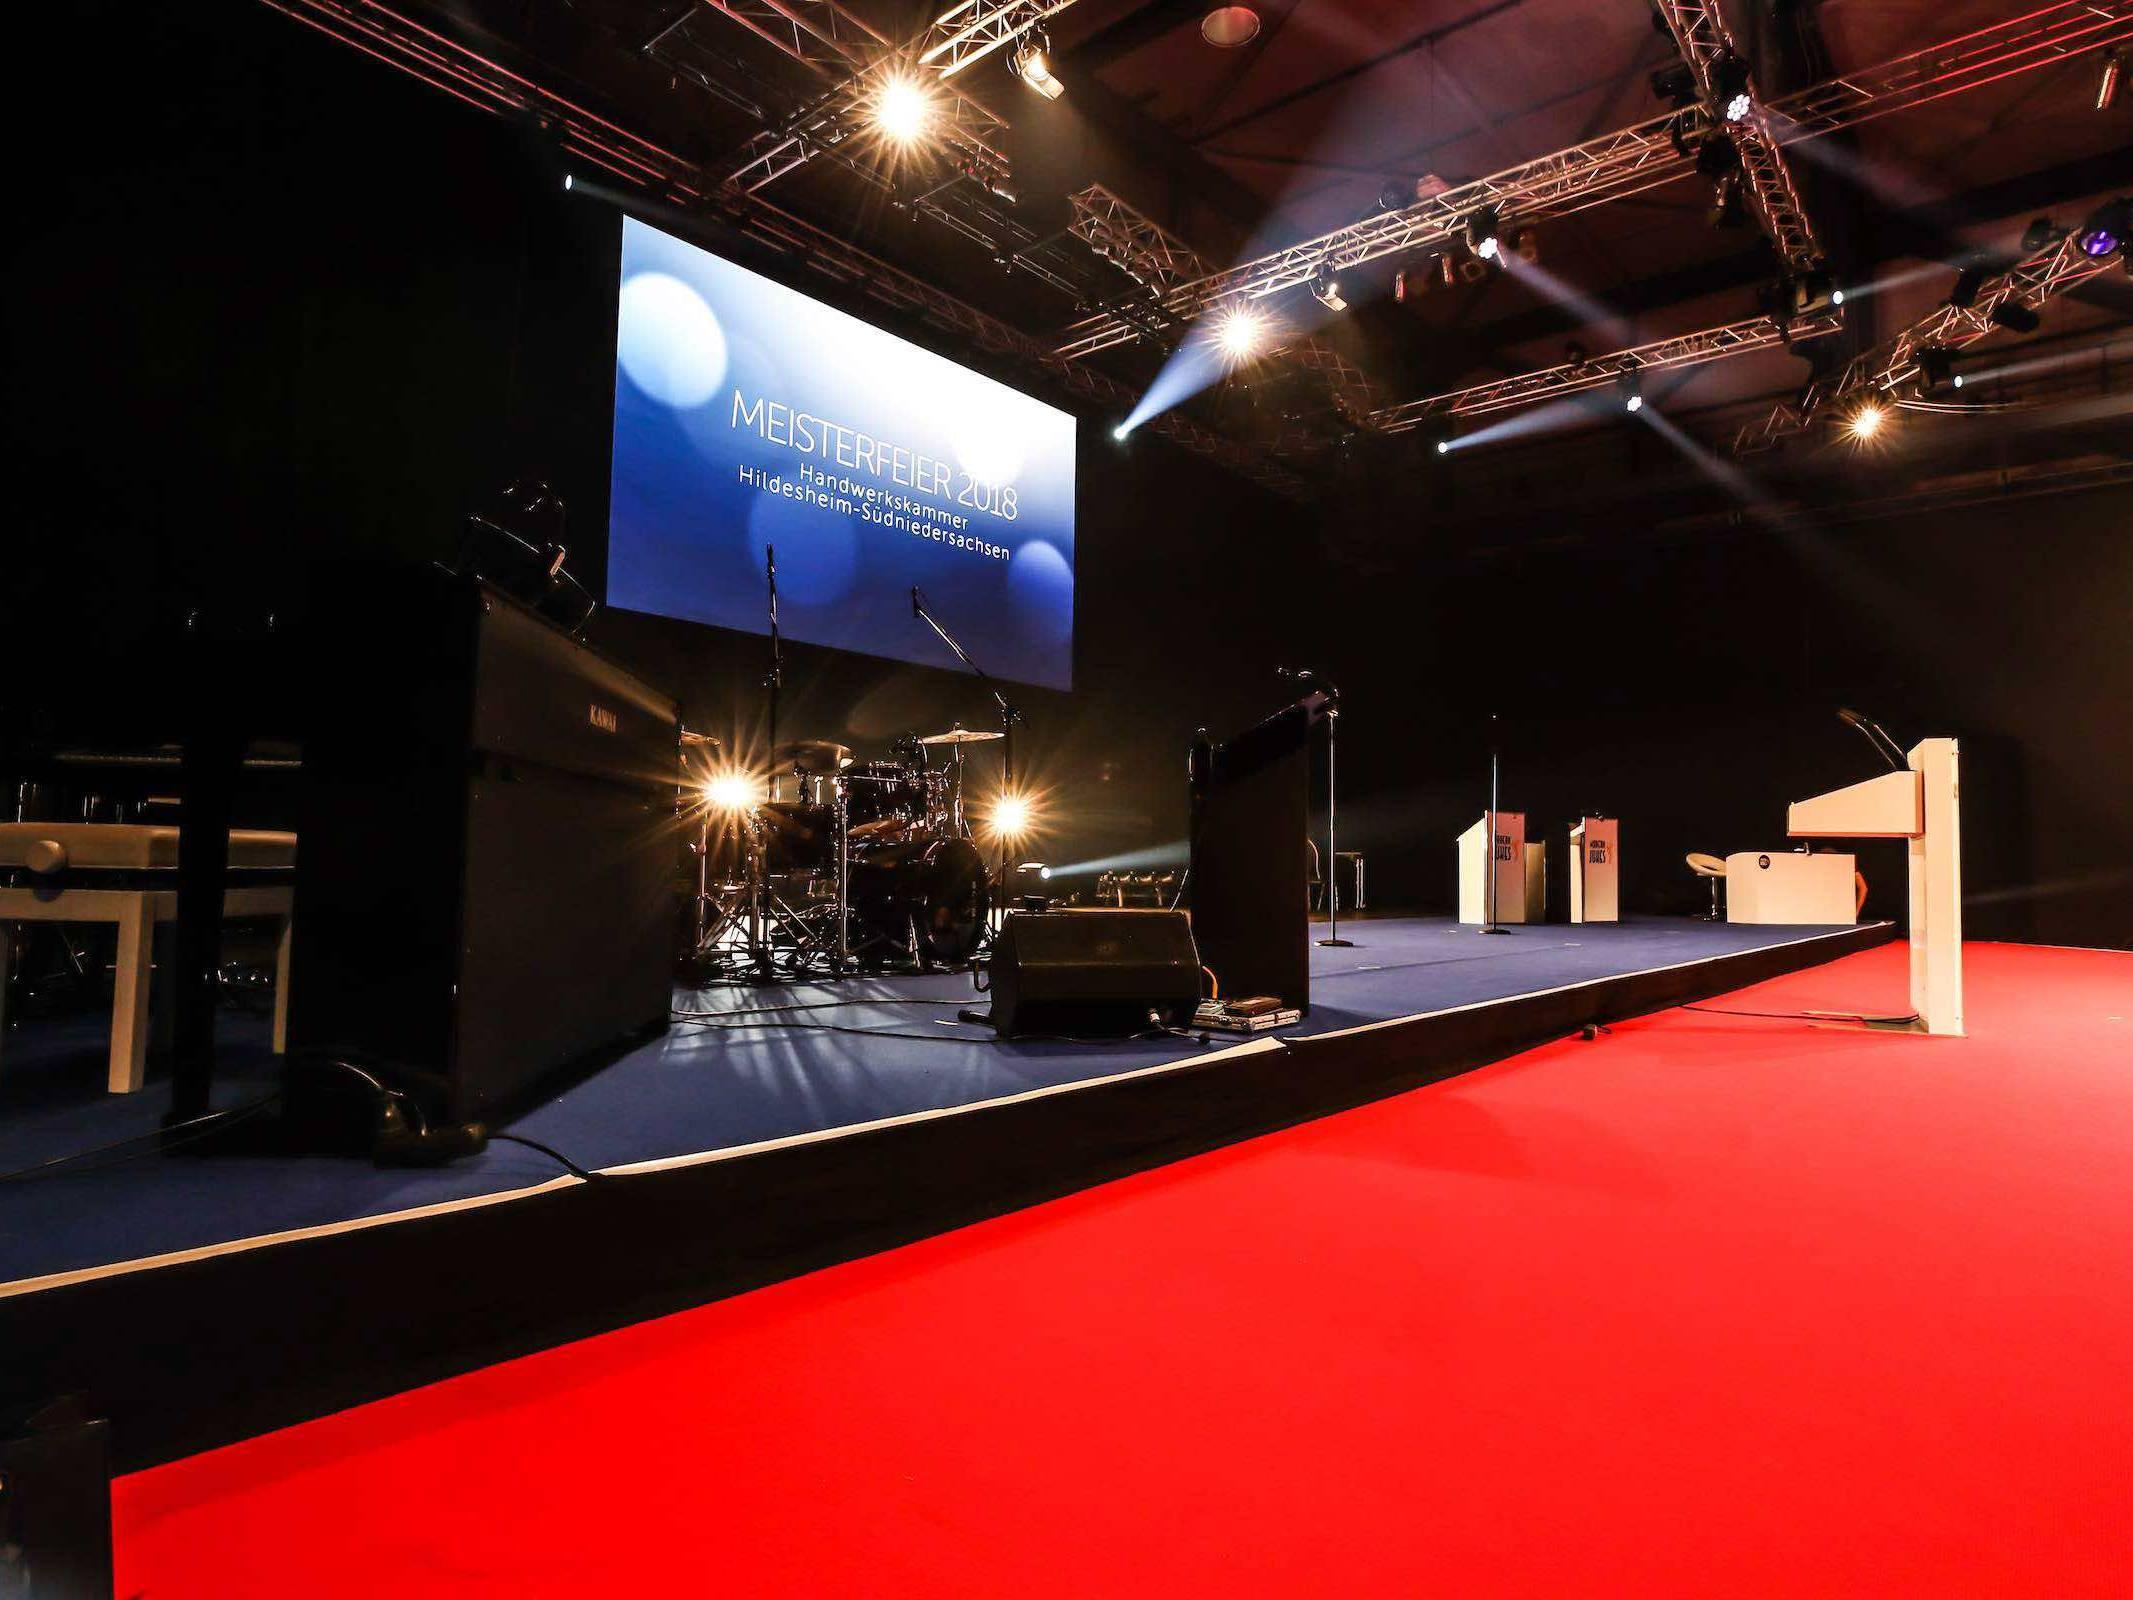 Eventplanung | Eventausstatung | Hamburg | Kongresse | Shows | Galas | Modenschauen | Produktpräsentationen | Bühnen | Licht | LCD | Leinwand | Tontechnik | Veranstaltungslogistik | Catering | Hamburgfeiert